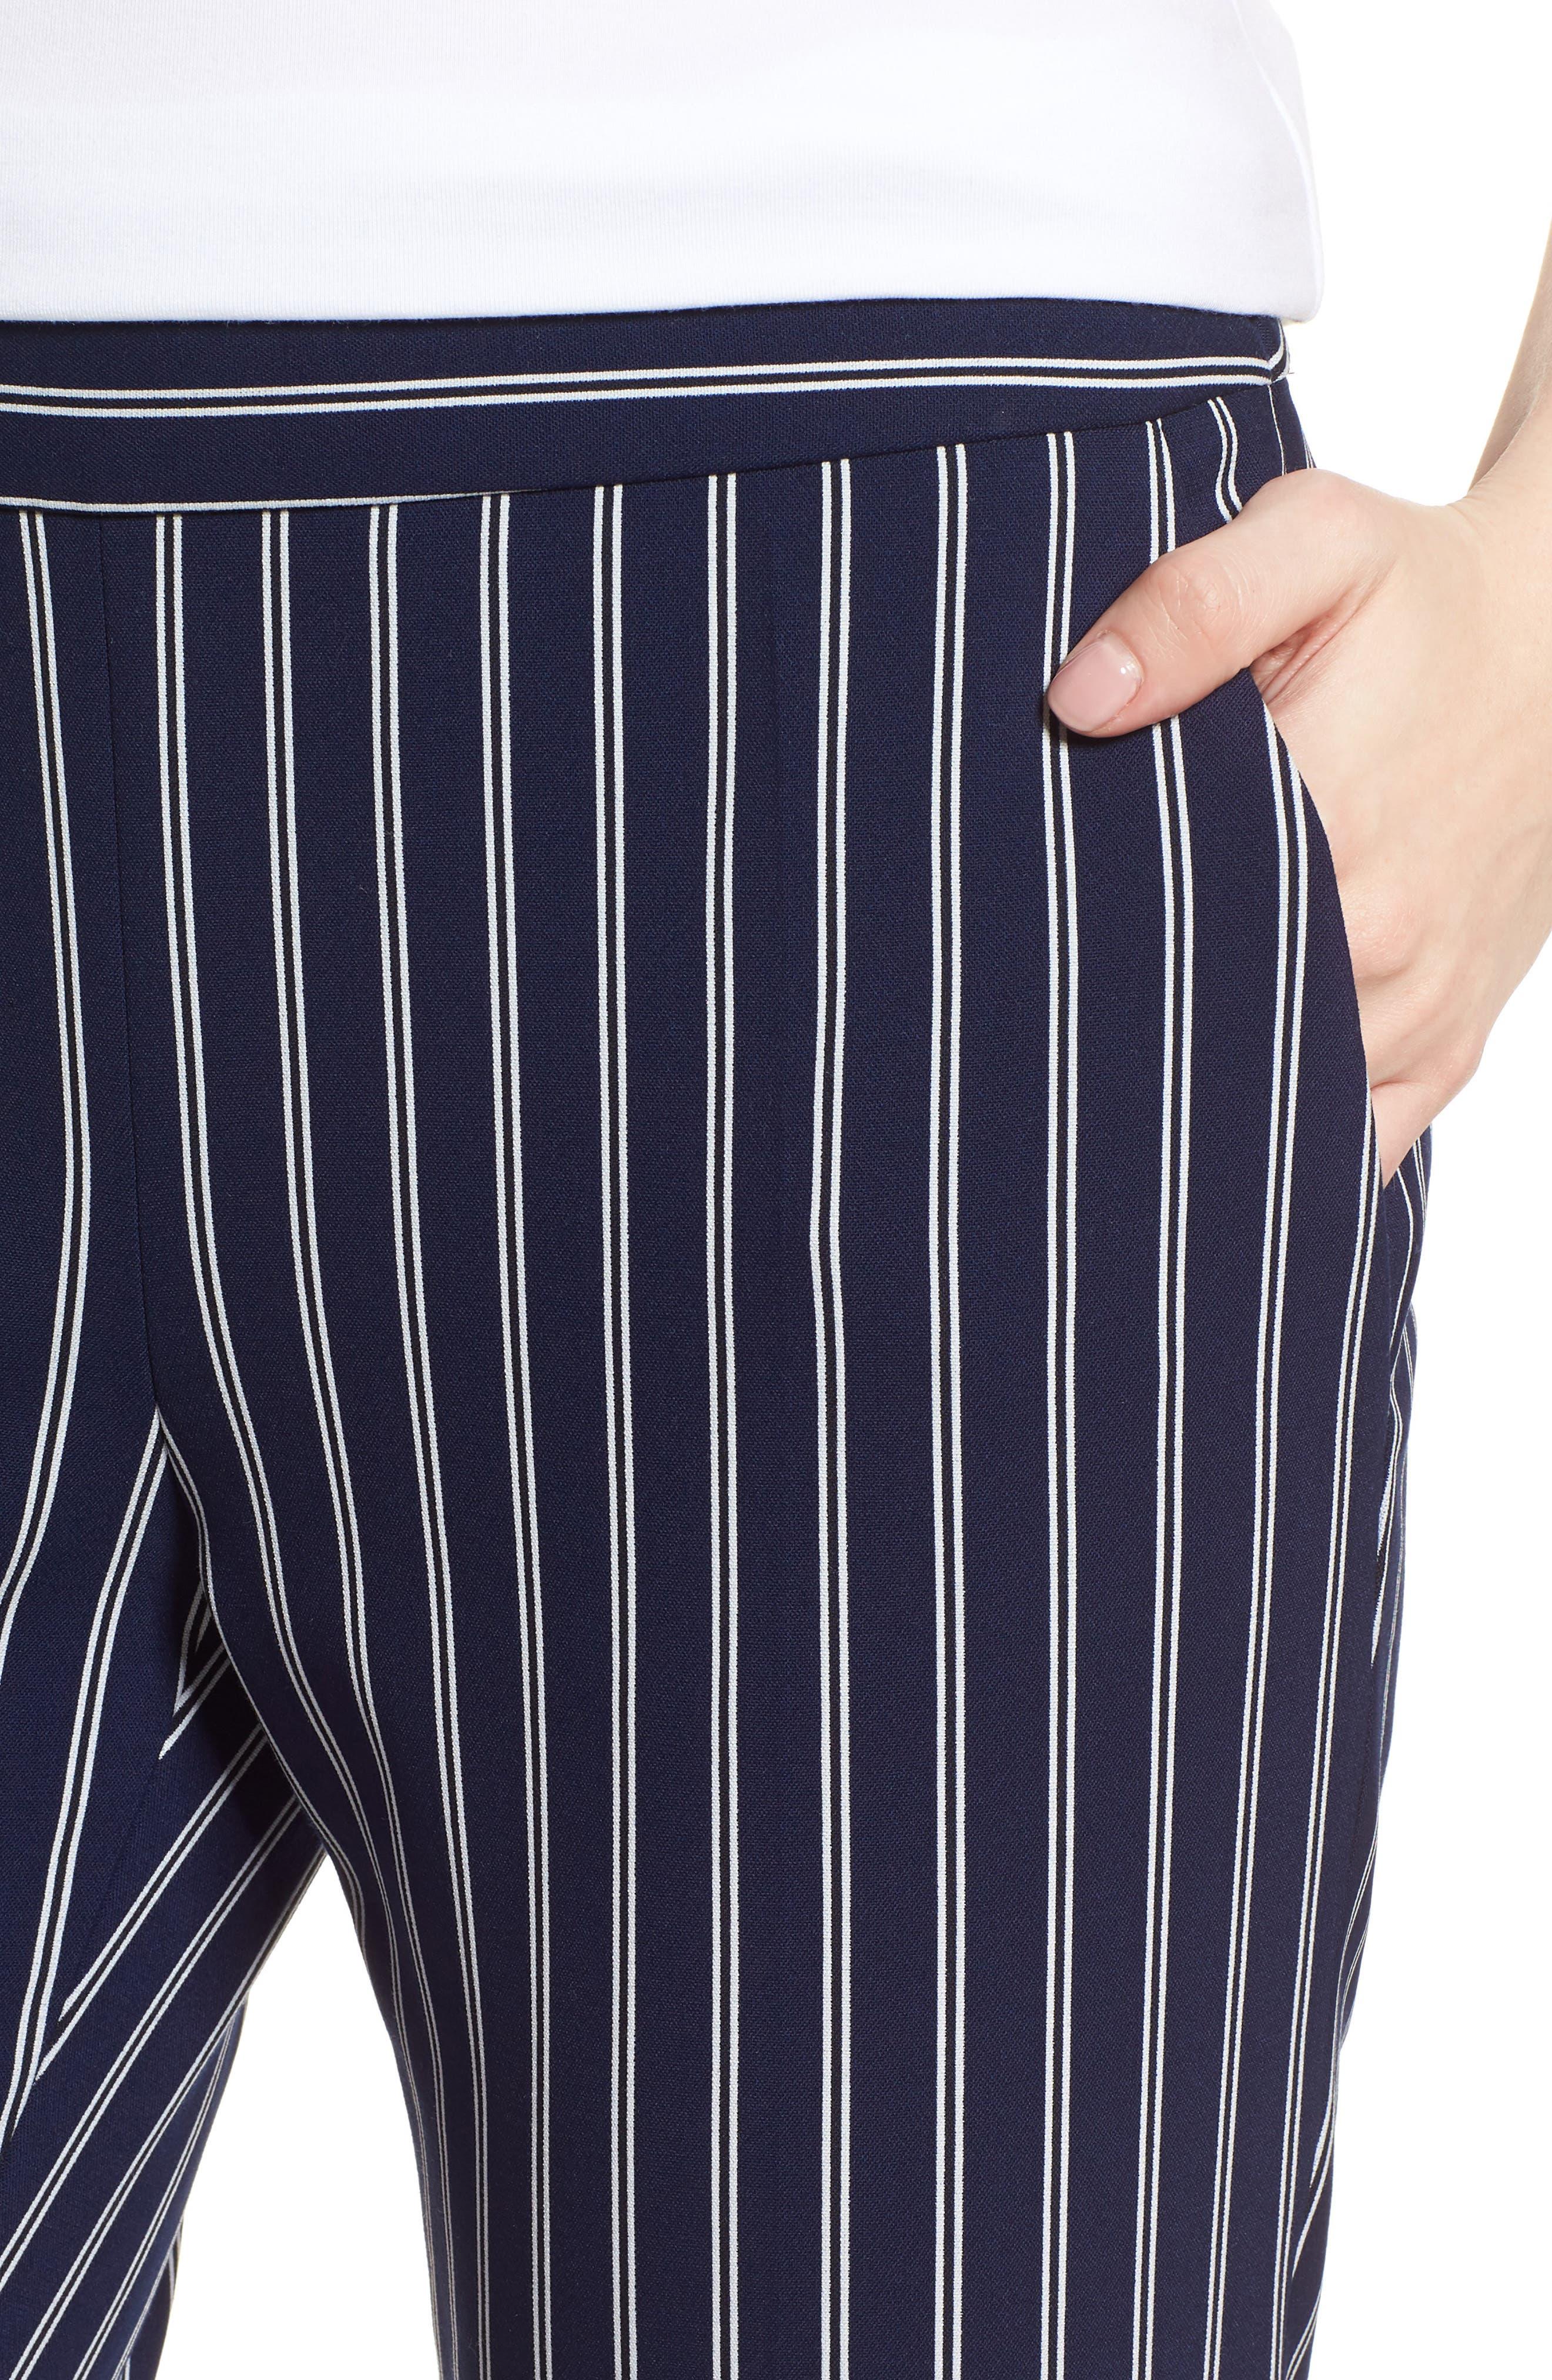 Tebella Stripe Pants,                             Alternate thumbnail 4, color,